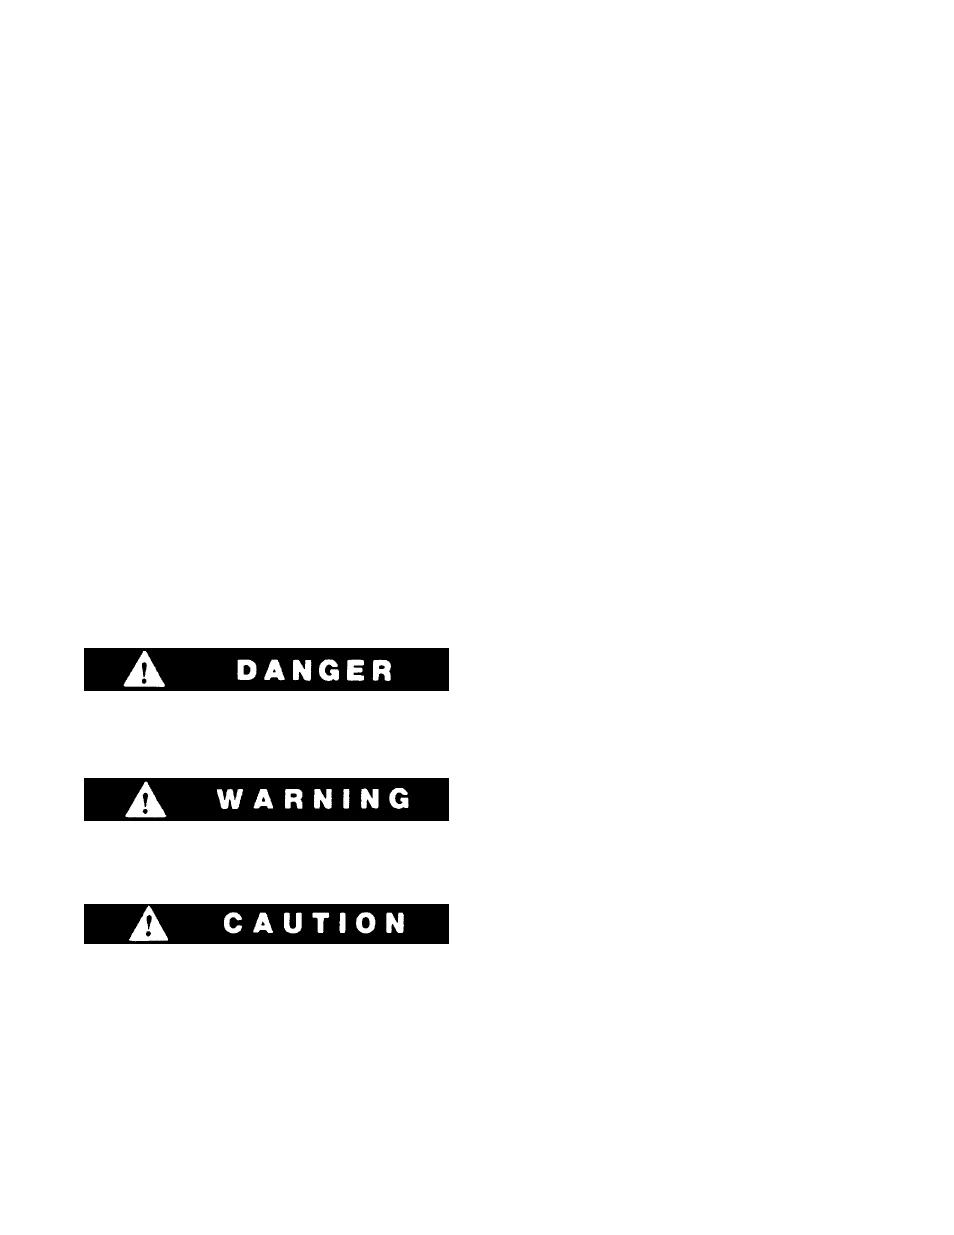 Safety highlights | Gradall 534B (9103-1380) Operation Manual User Manual |  Page 5 / 34